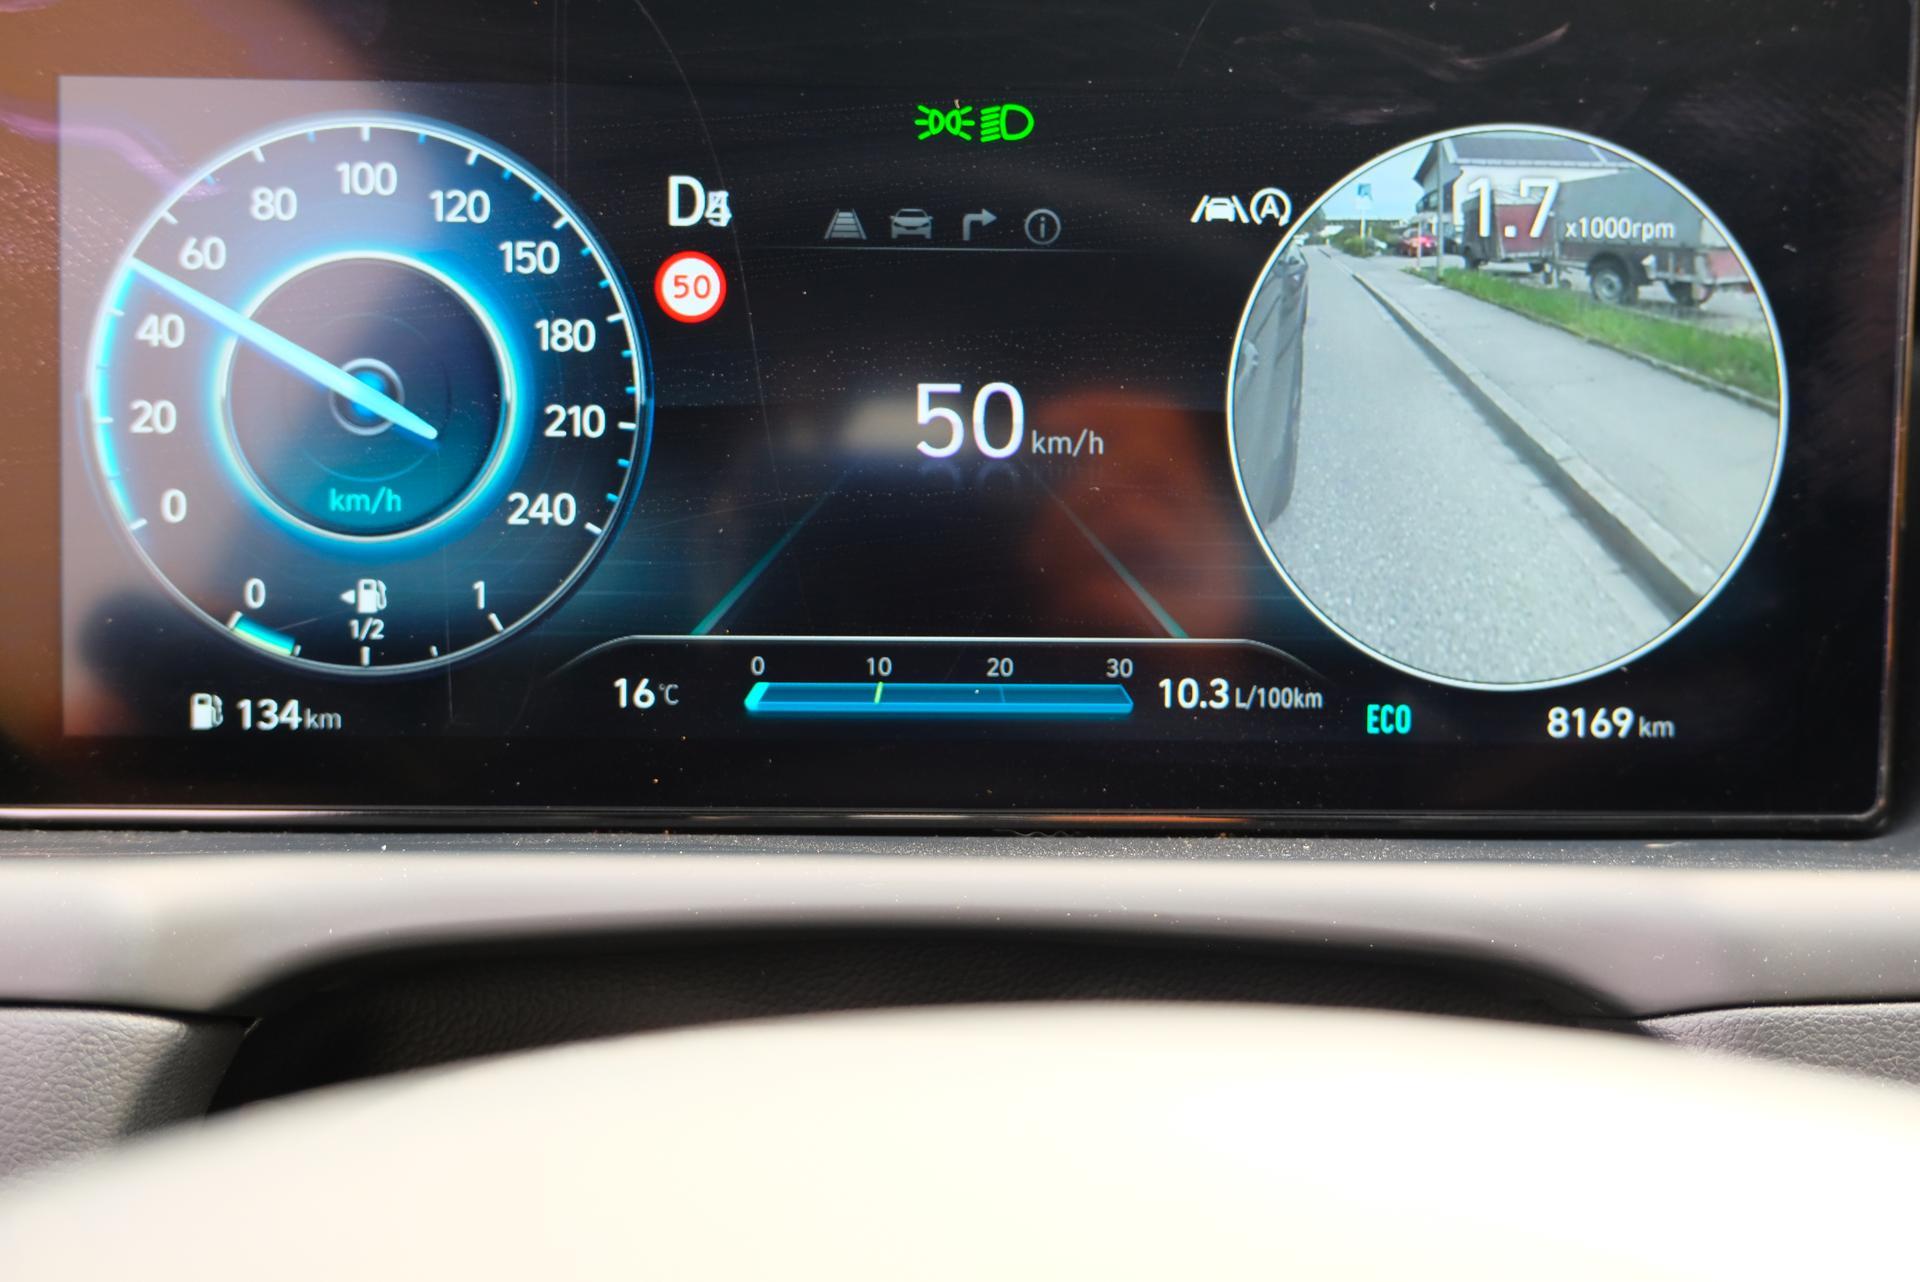 Hyundai Tucson 1.6 T-GDI HEV 4x4 Digetales Cockpit